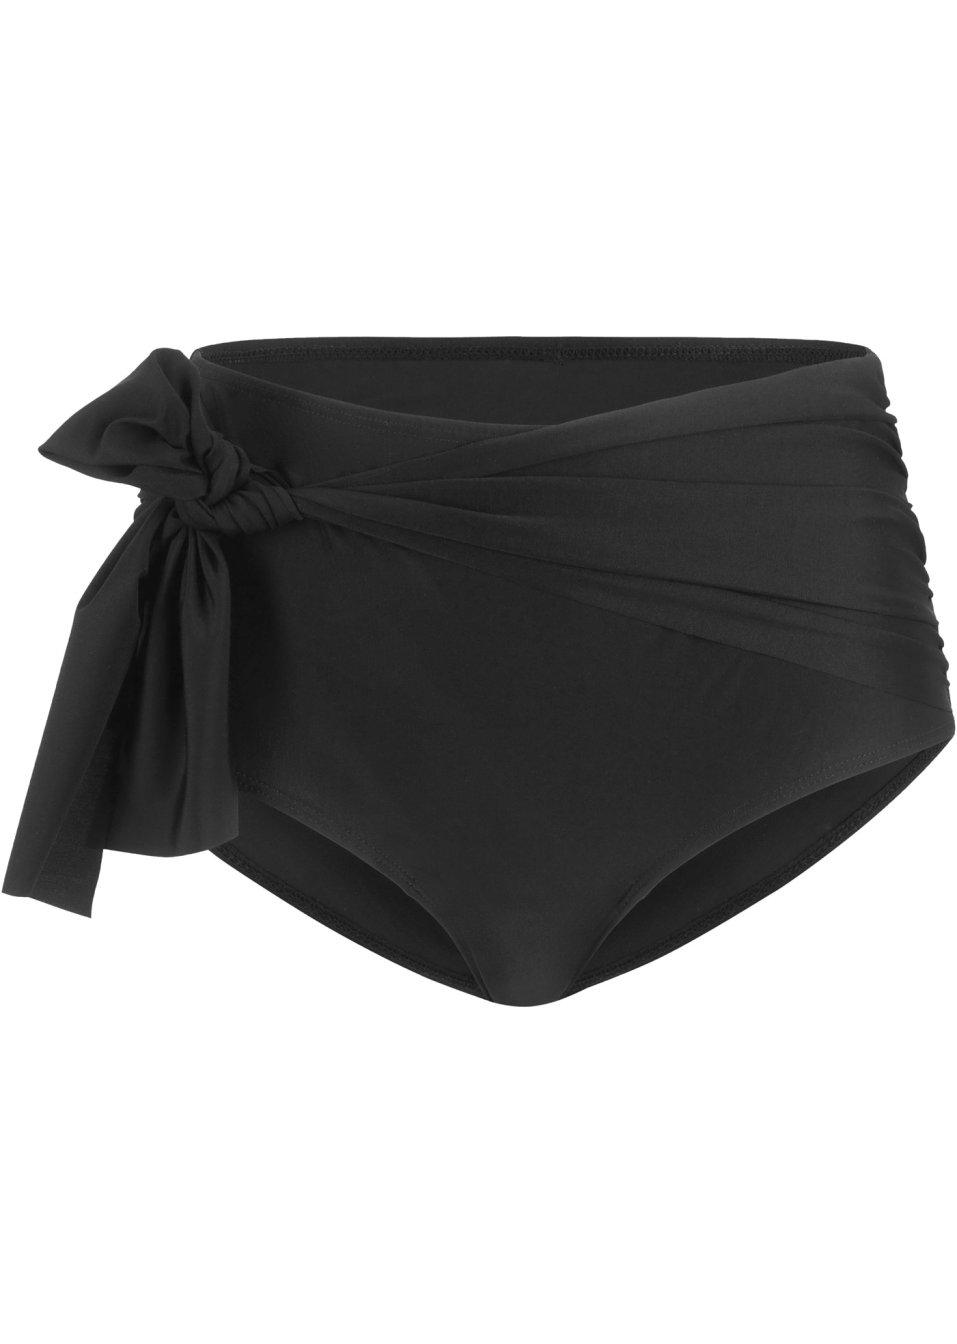 Abwechlungsreiche Shape Bikinihose mit Shapewear-Effekt - schwarz cBh9x nmdlJ